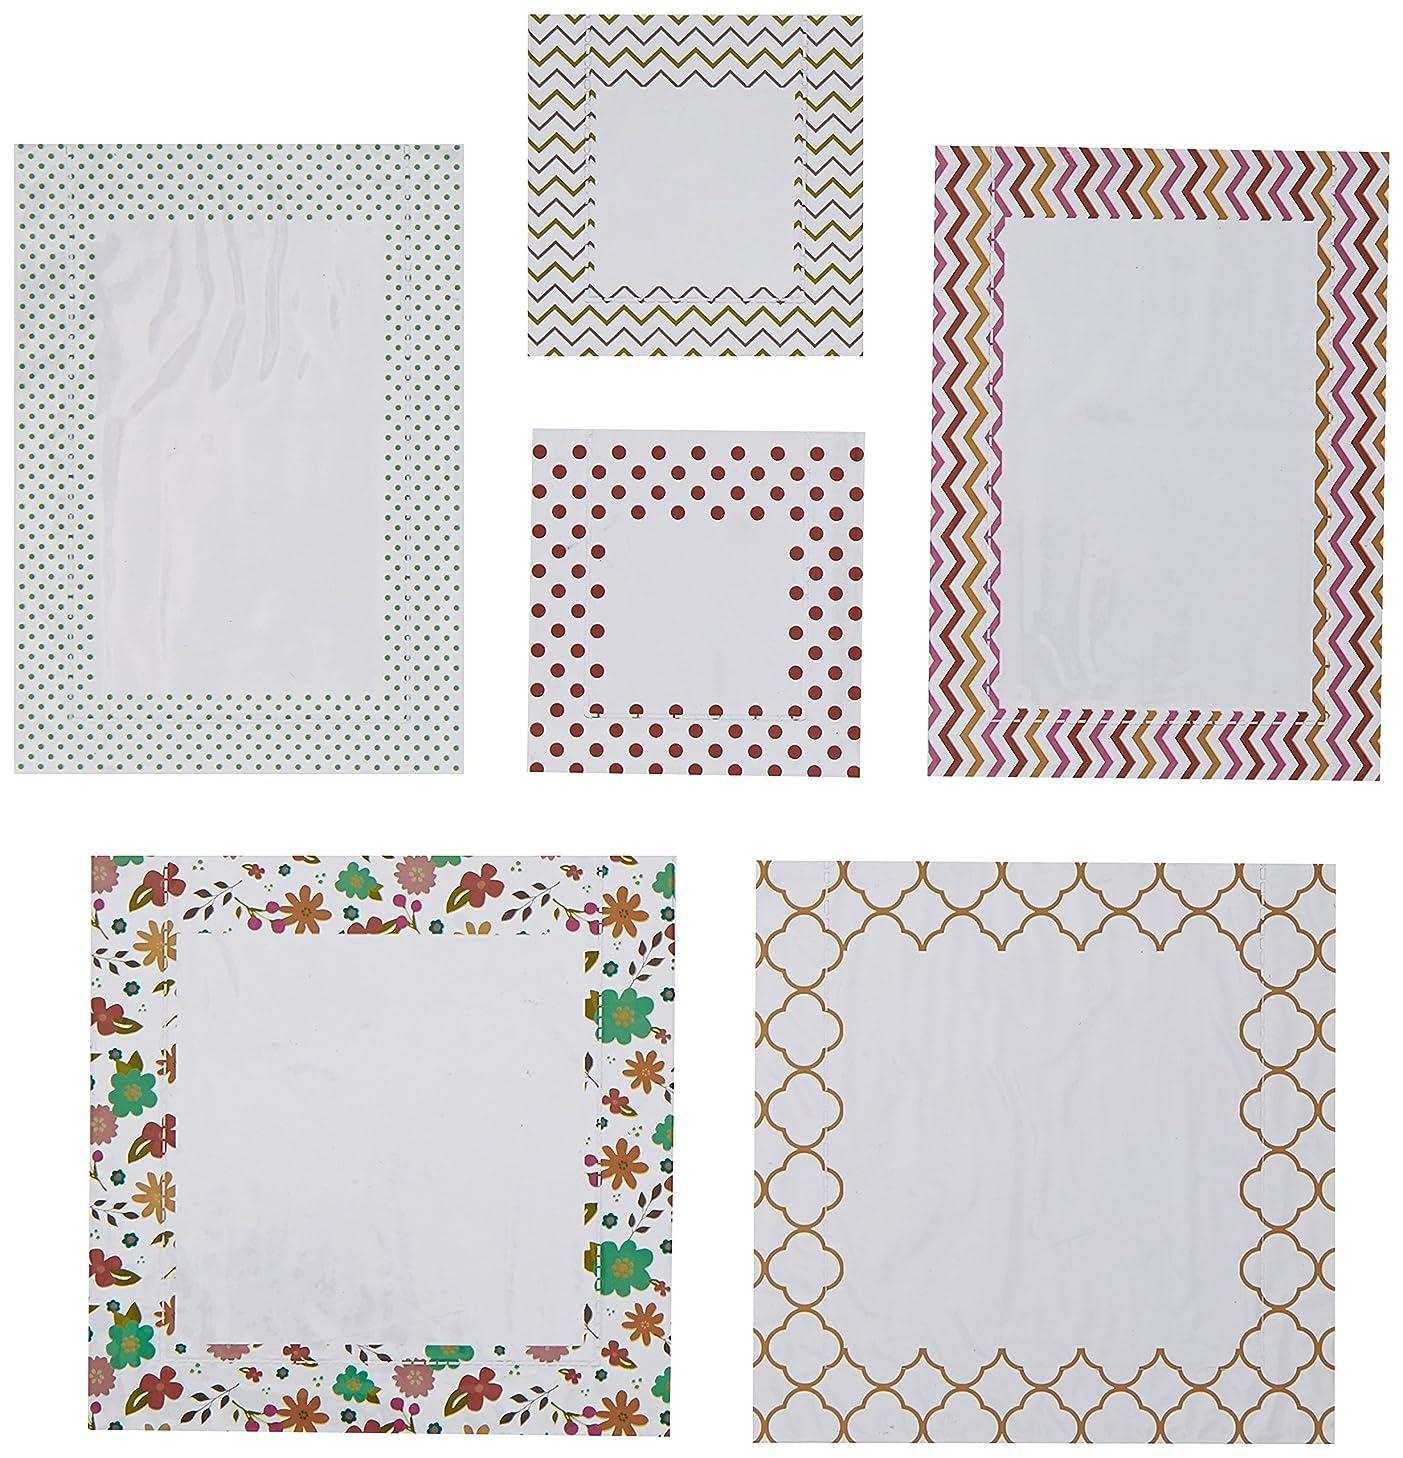 Hazel & Ruby HRPP-386 Pic Pockets Die-Cut Cardstock Embellishment on Trend, 6-Pack